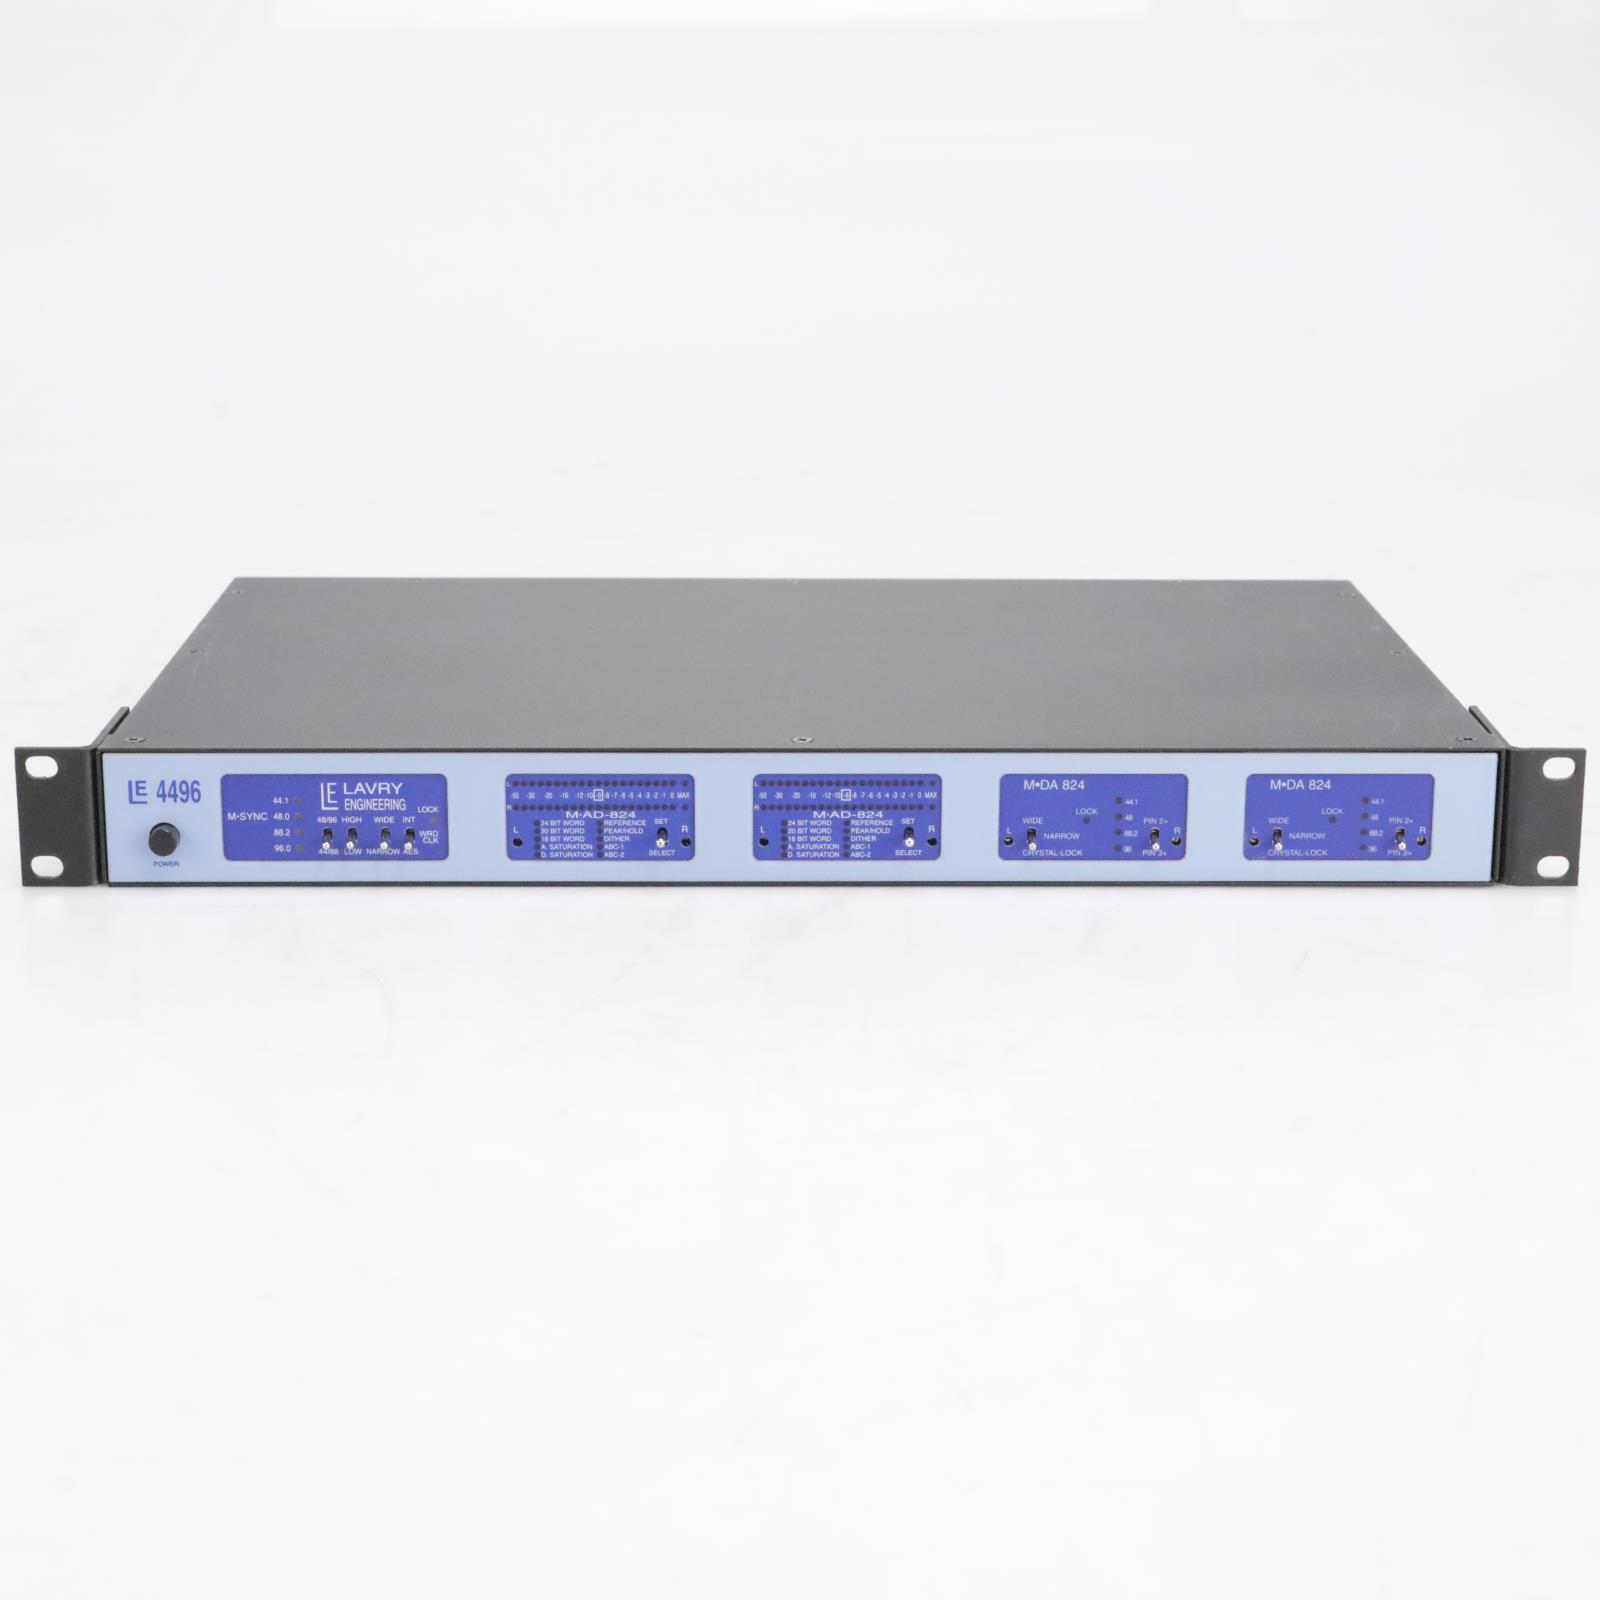 Lavry Engineering 4496 Clock AD/DA Converter 2x M-AD 2x M-DA 1x M-SYNC #42515